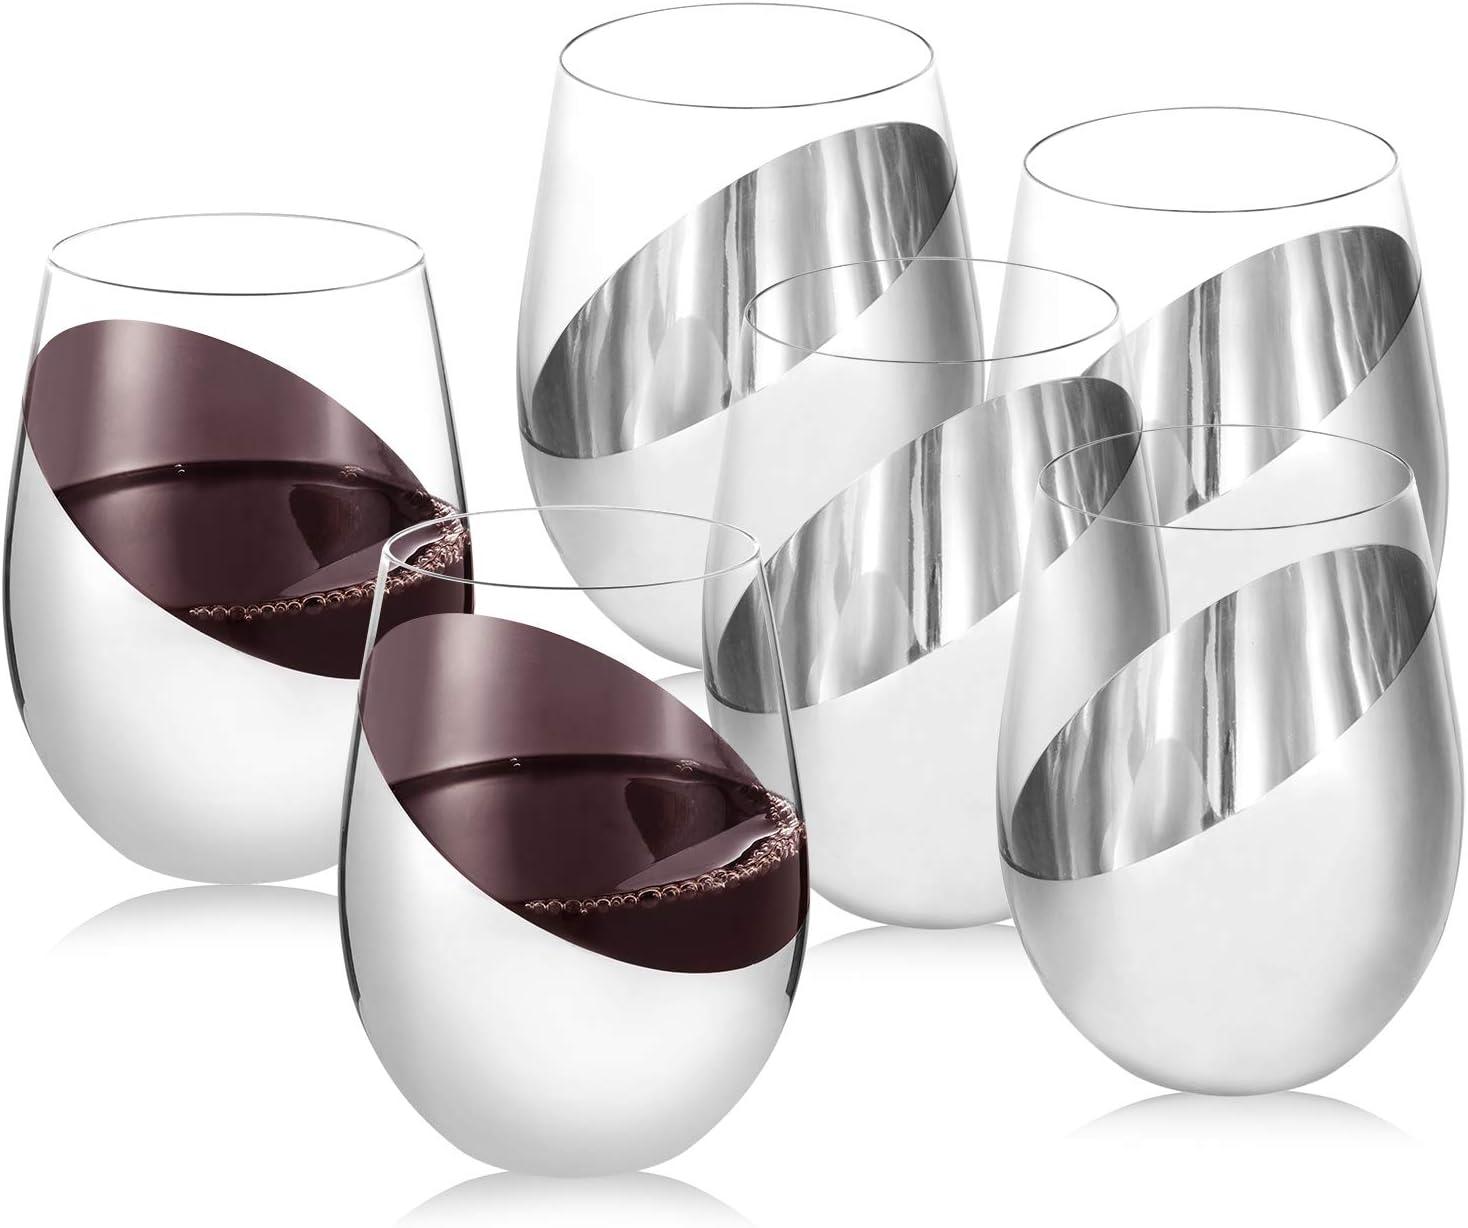 MyGift Modern Tilted Silver Tone Metallic Stemless Wine Glasses, Beverage Drinkware Tumbler Cups, Set of 6